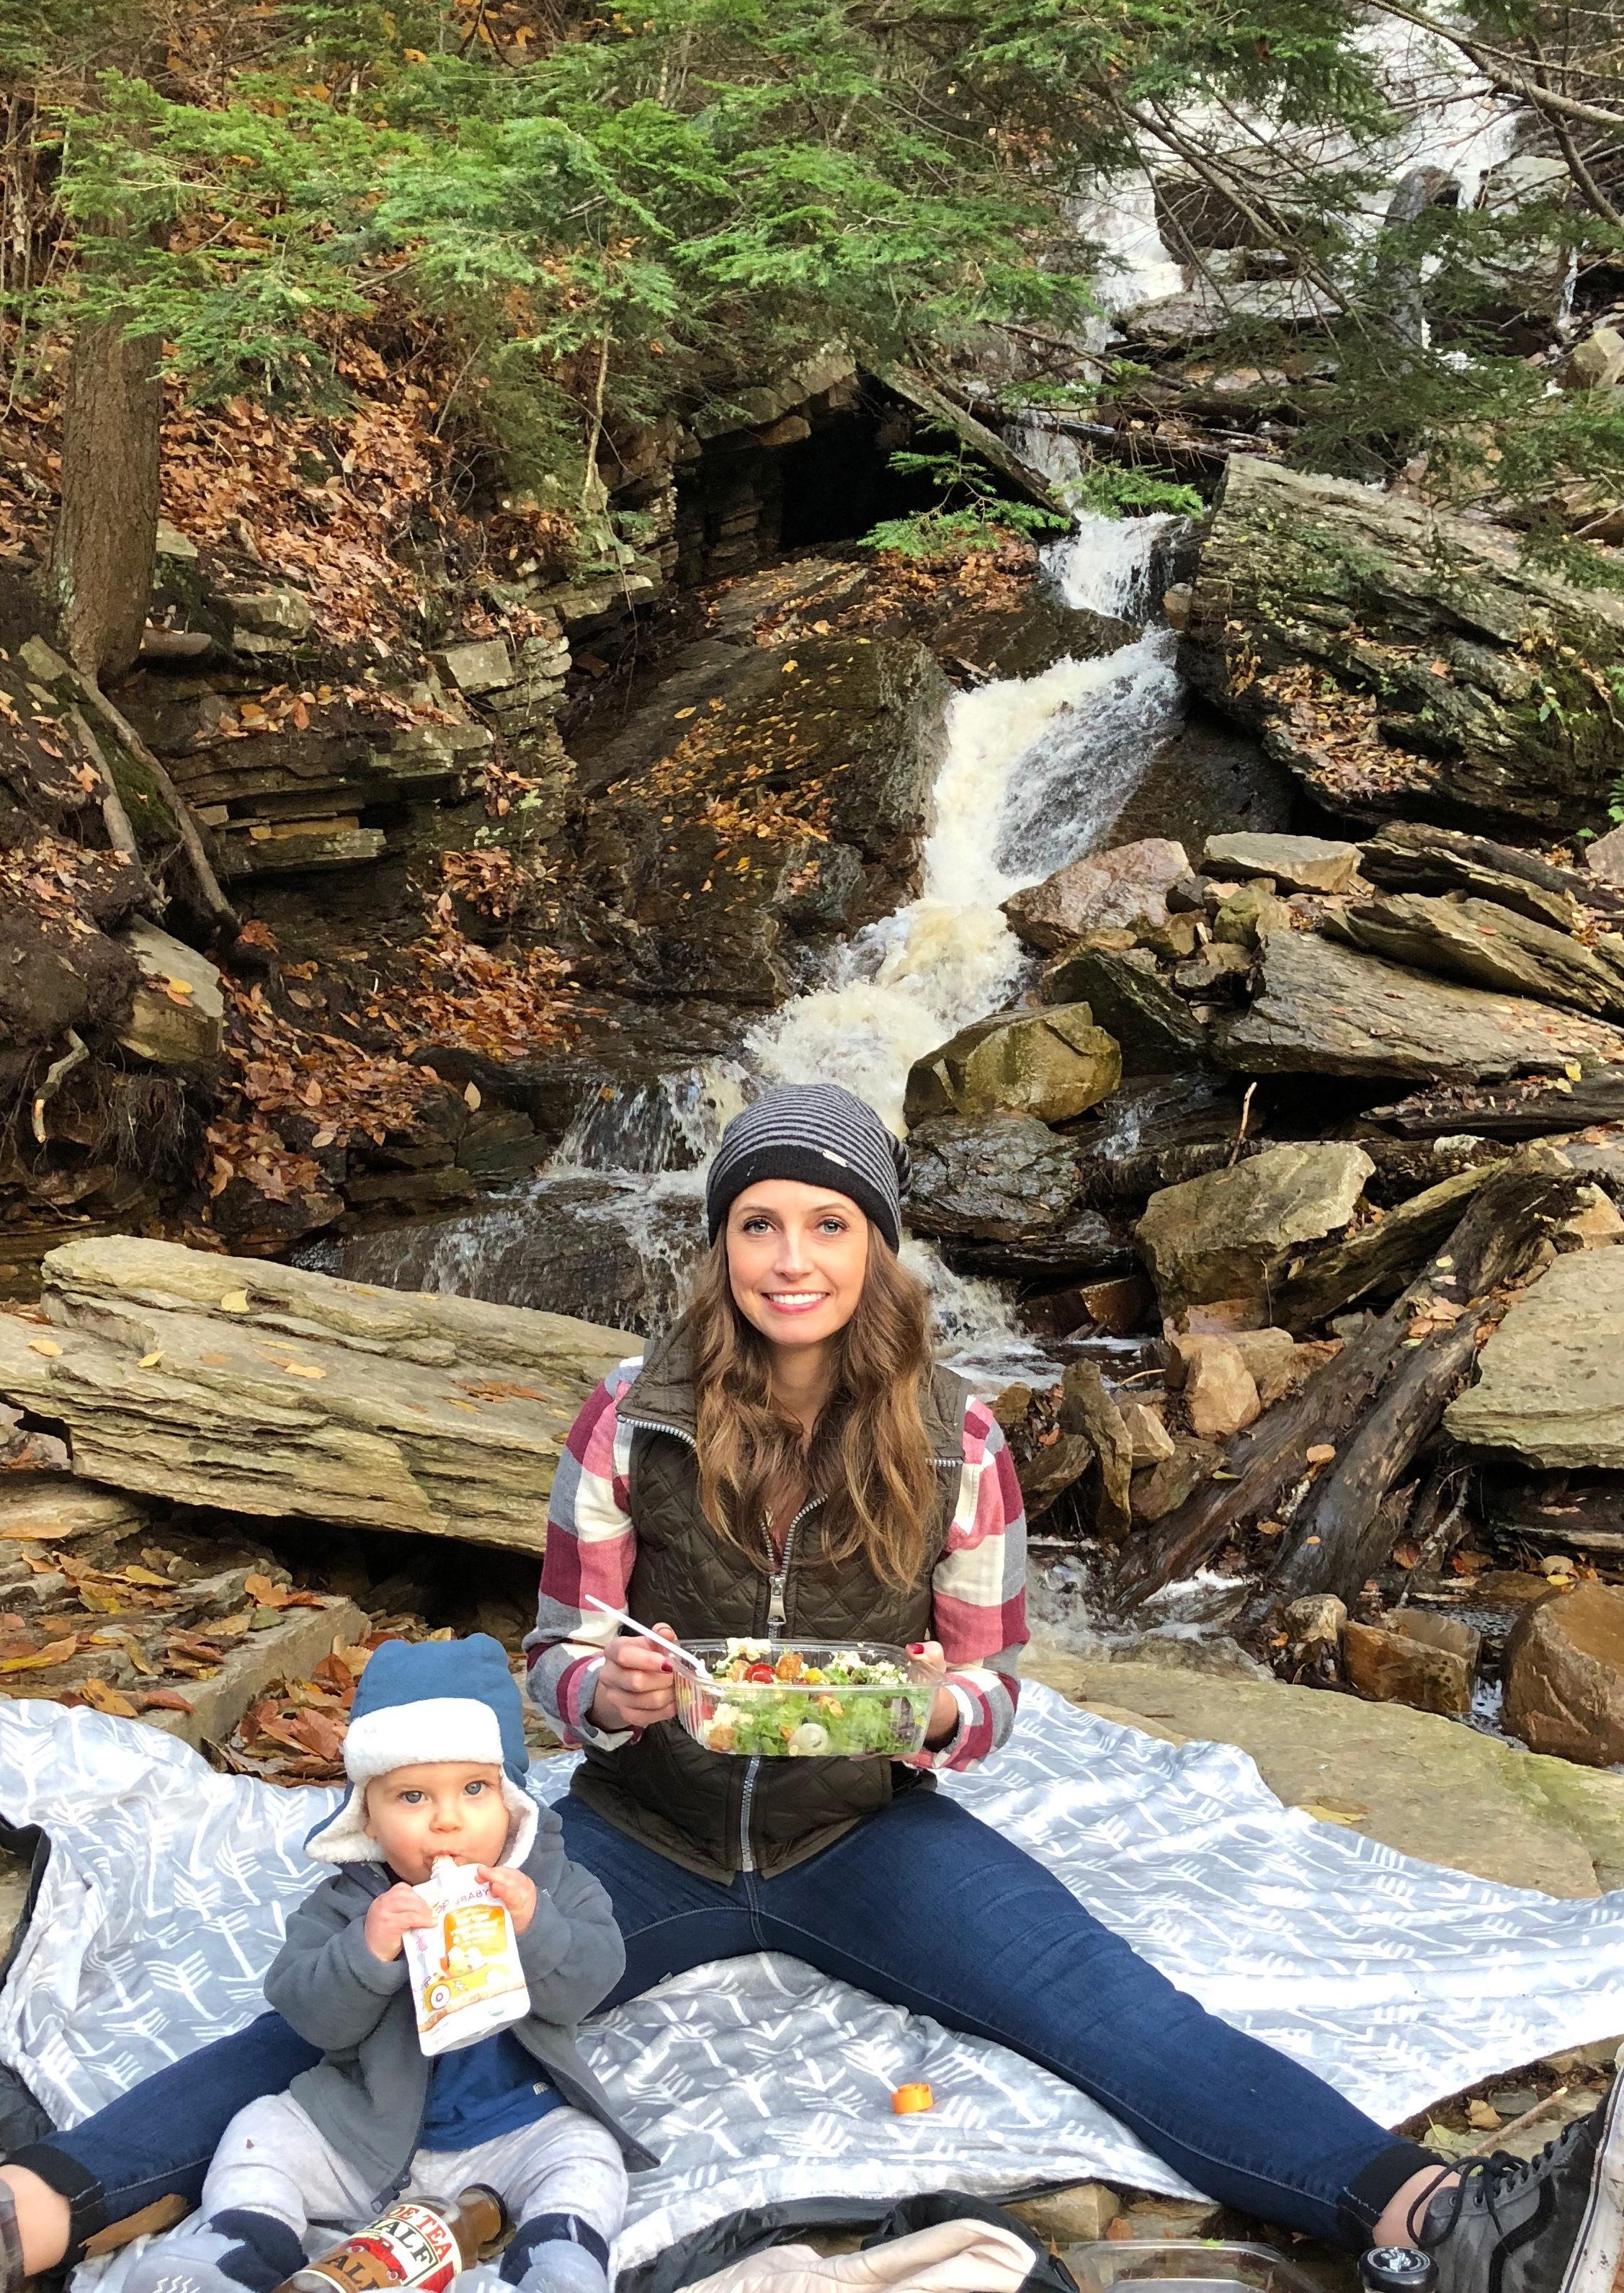 eating lunch at lye brook falls waterfall